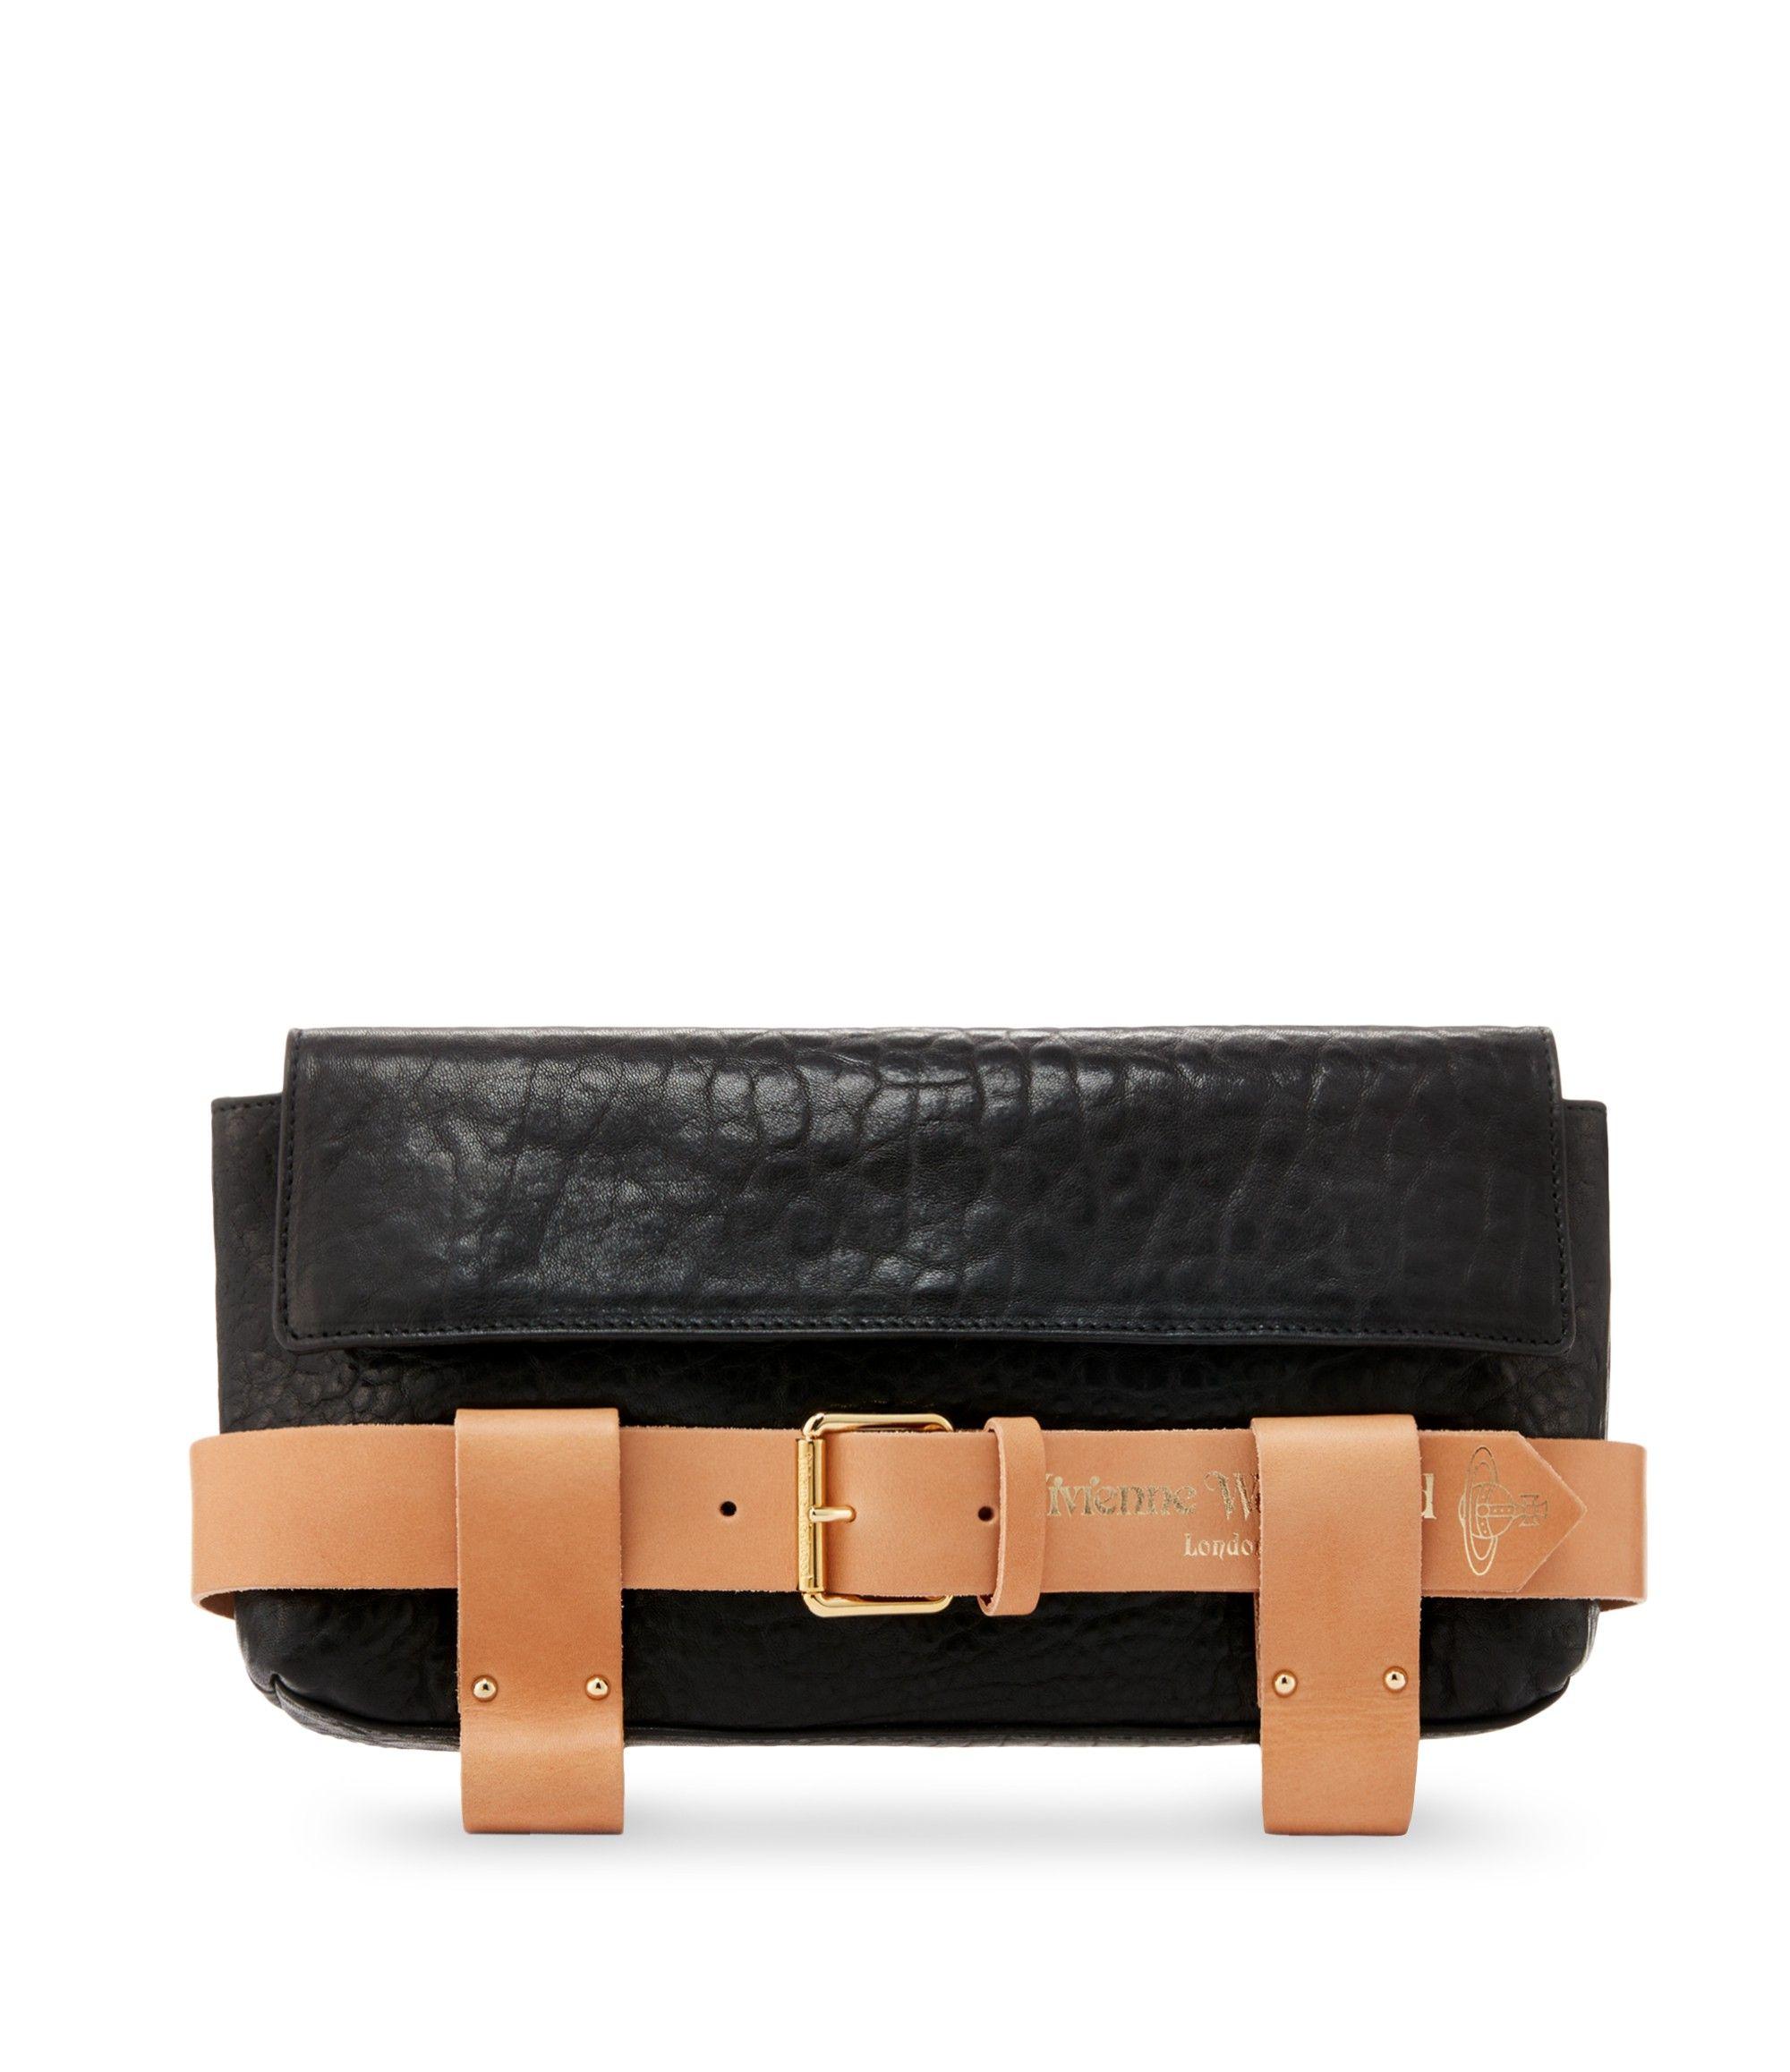 VIVIENNE WESTWOOD Bondage Clutch 7111 Black/Tan. #viviennewestwood #bags  #shoulder bags